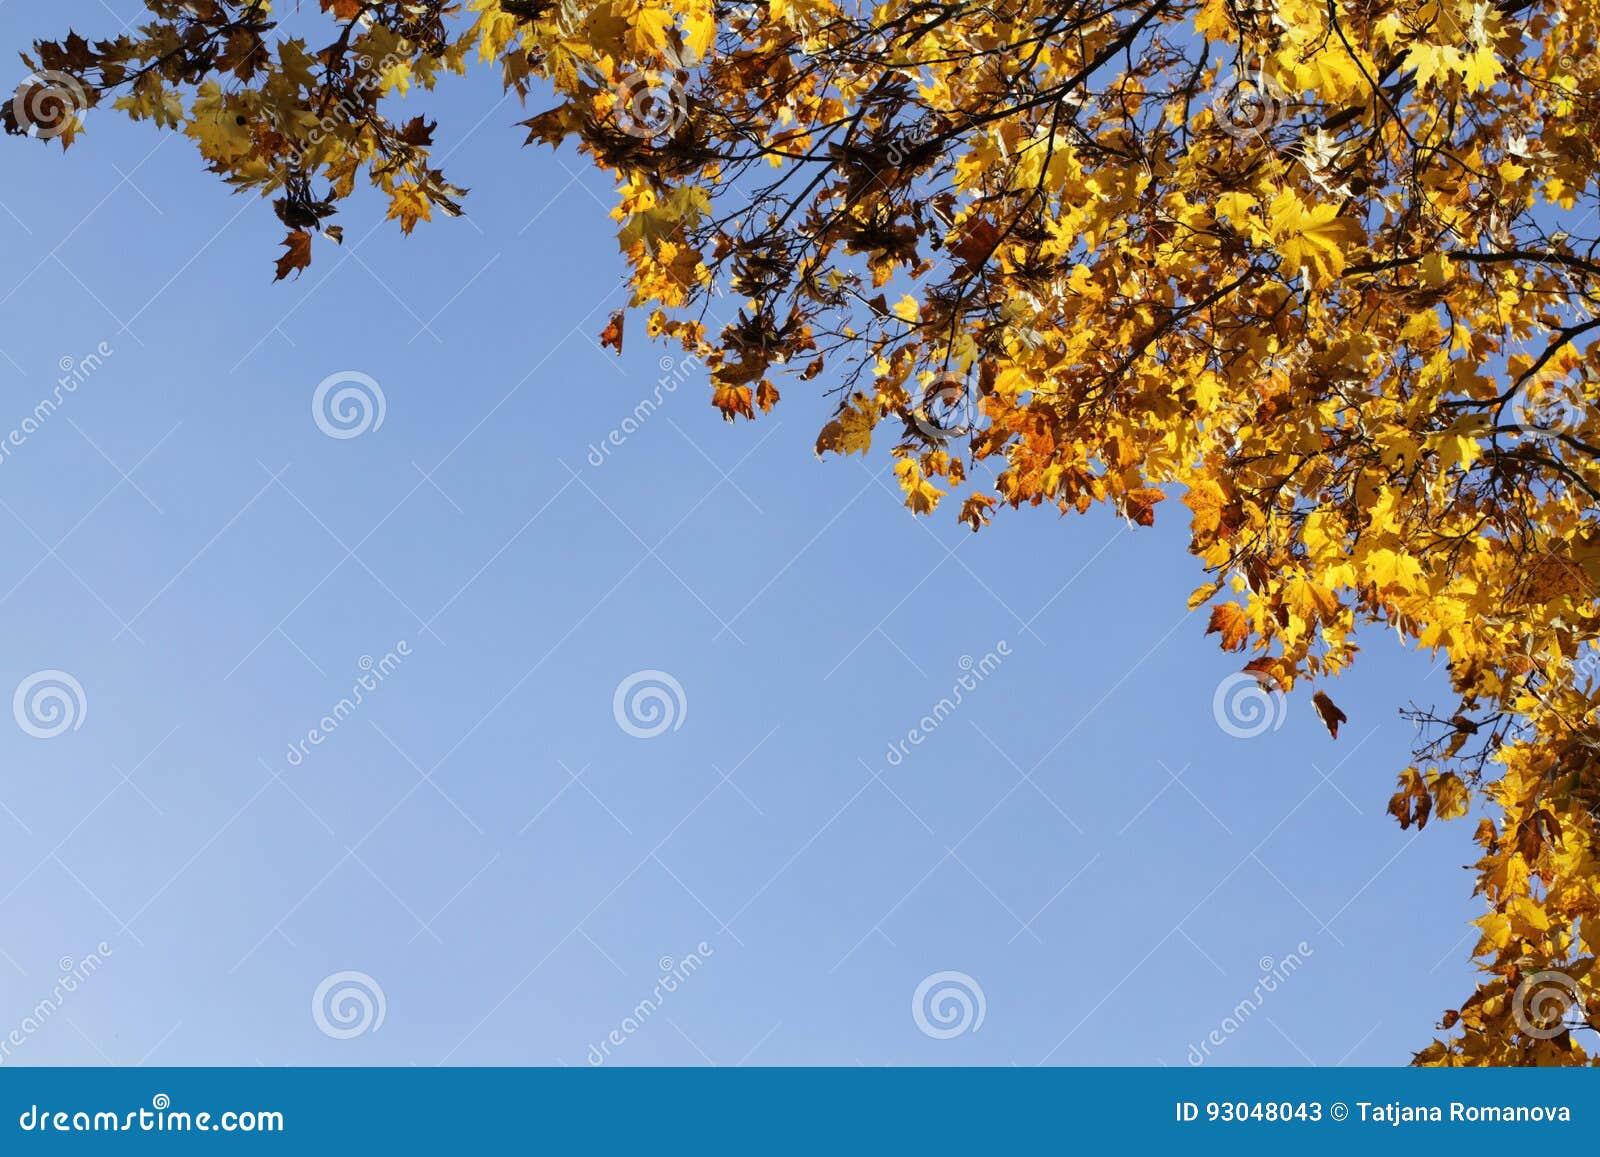 Autumn yellow leafs on blue sky